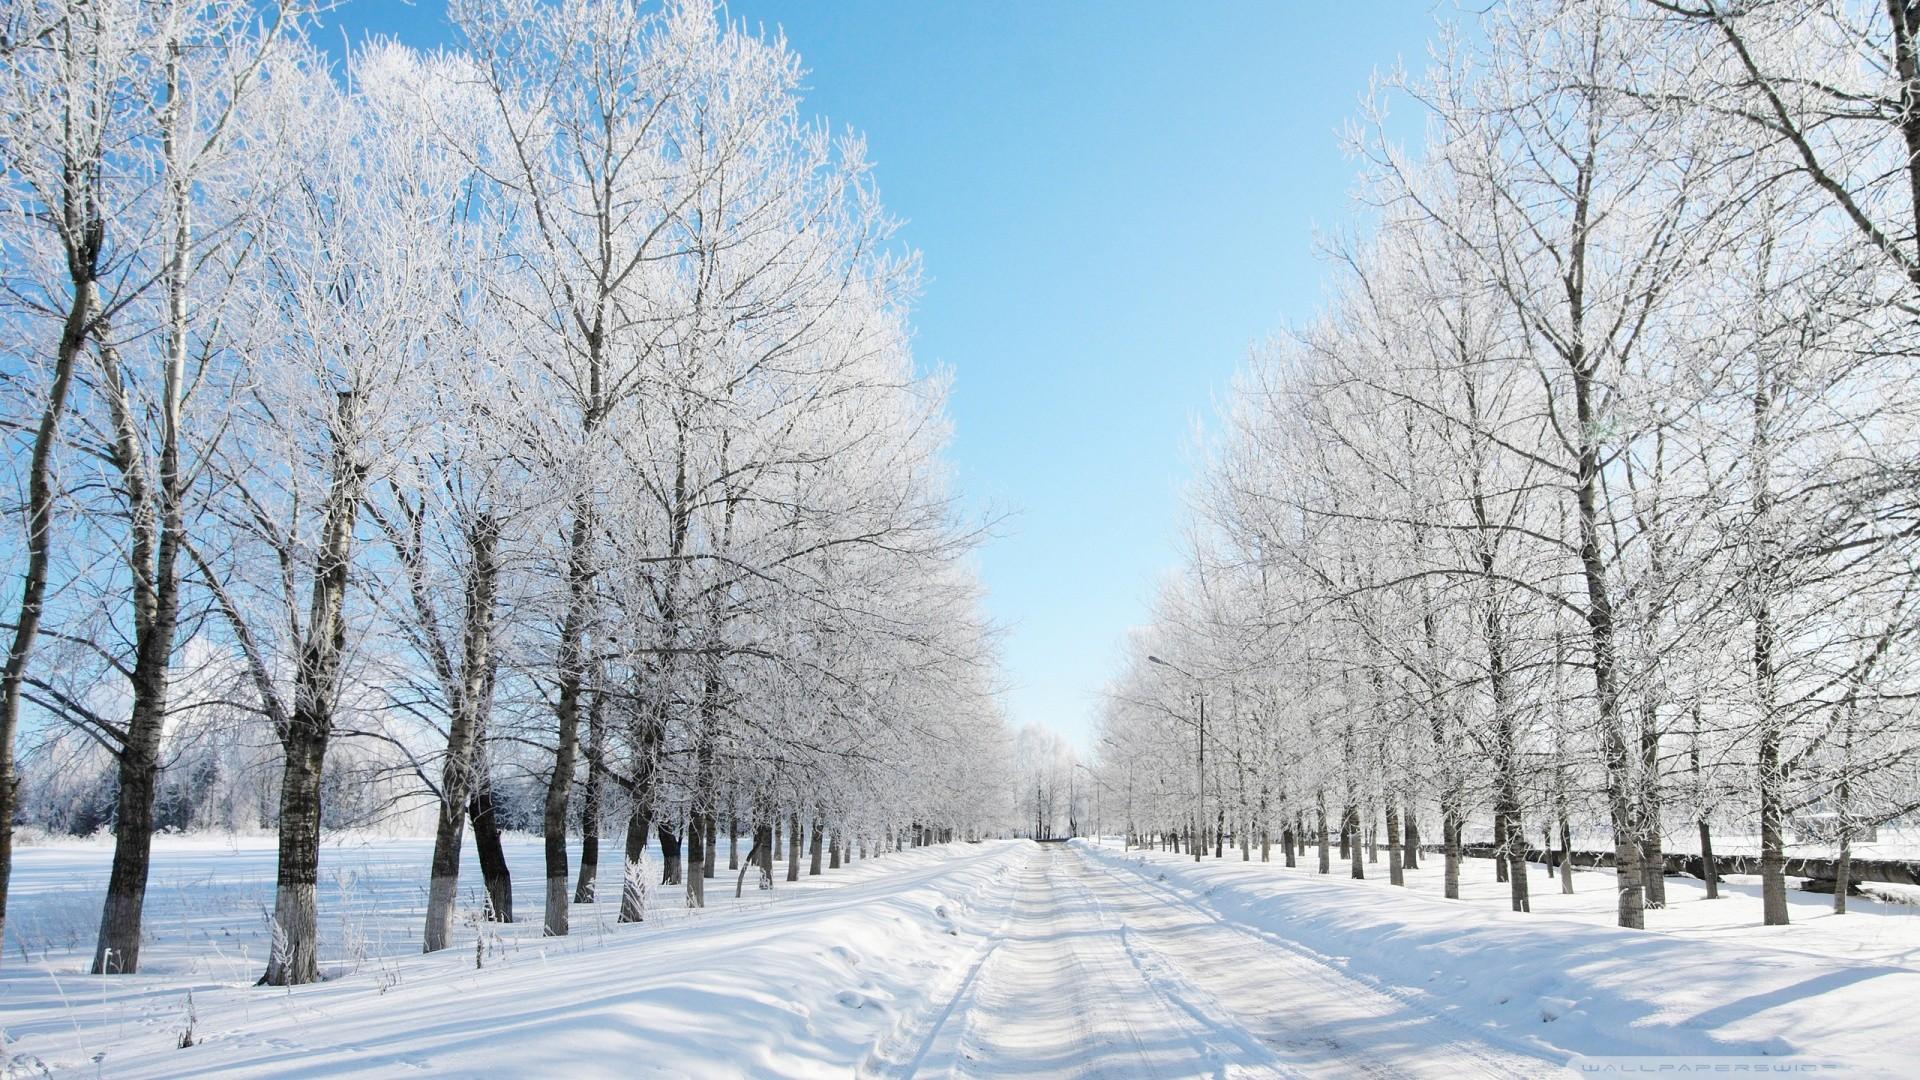 1920x1080 Beautiful Snow Hd Image Widescreen Natural Wallpaper